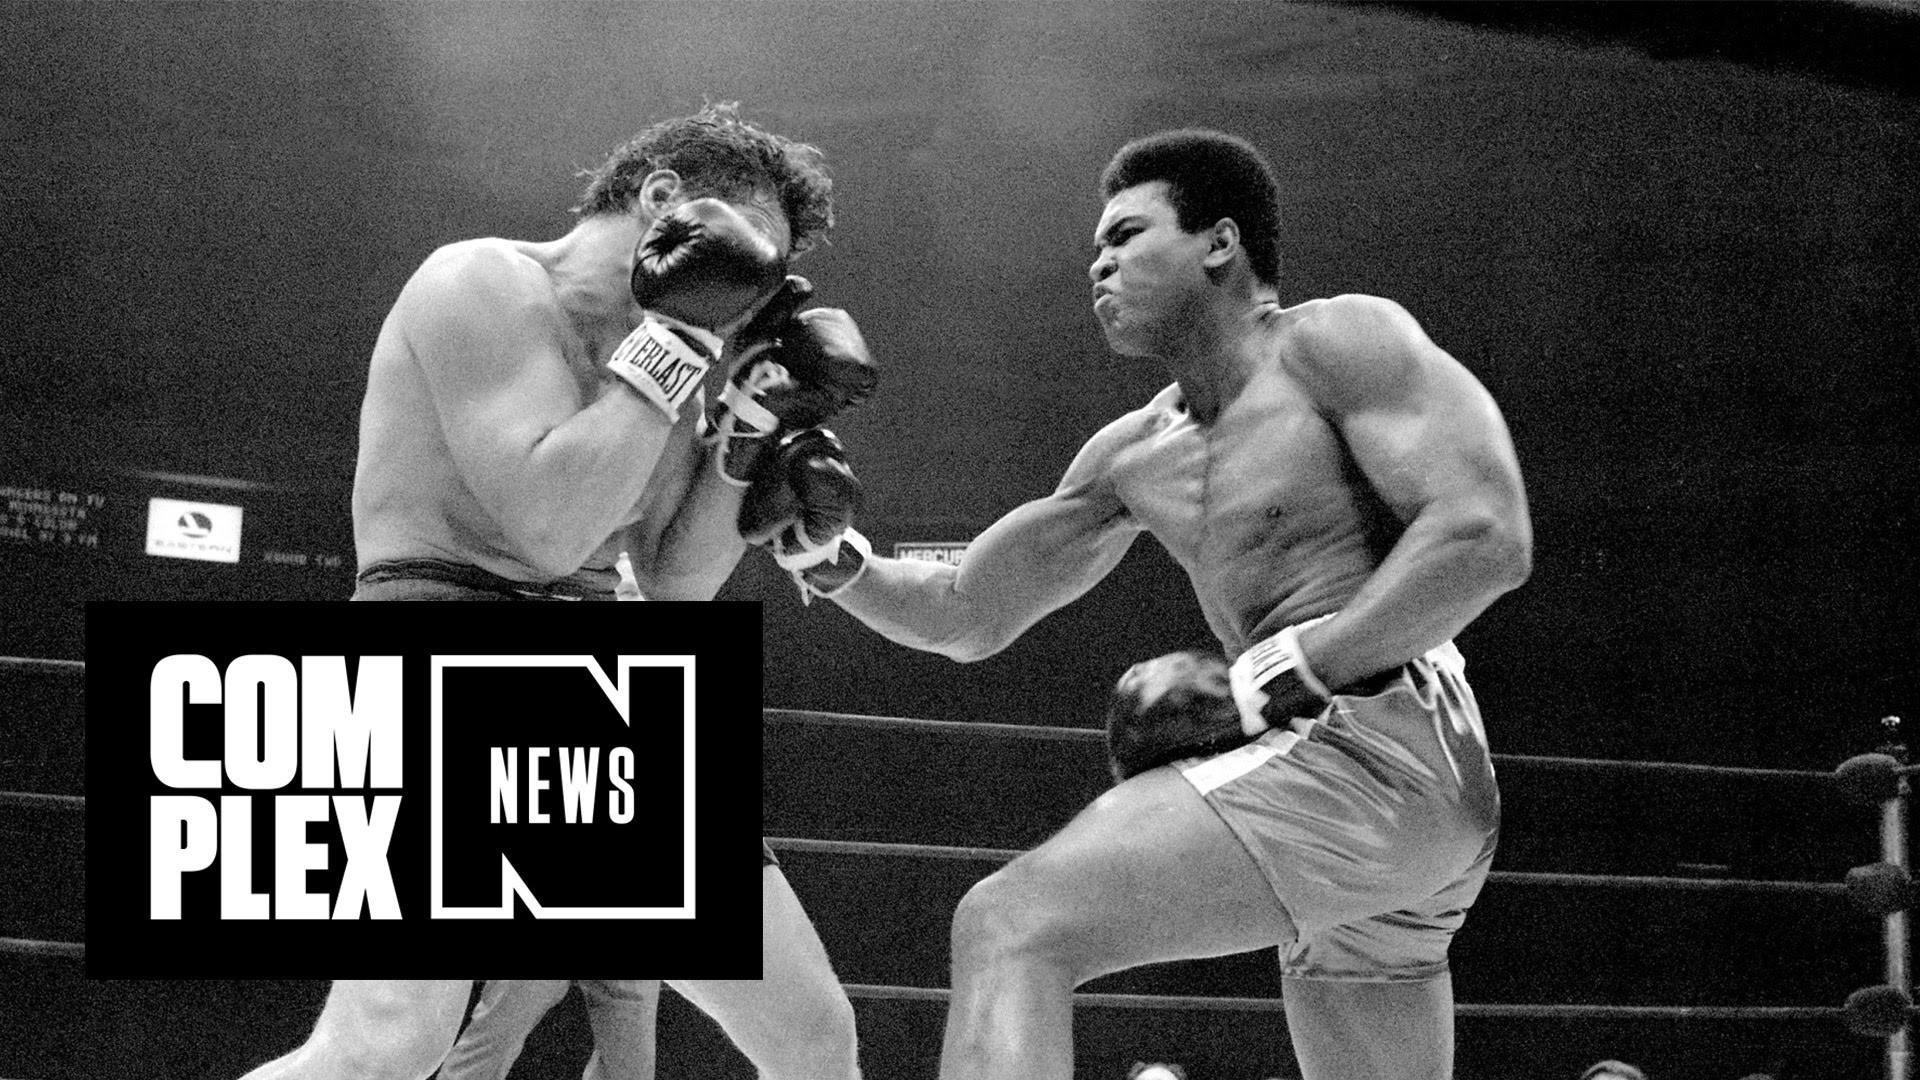 Muhammad Ali Wallpaper 1920x1080 (78+ images)